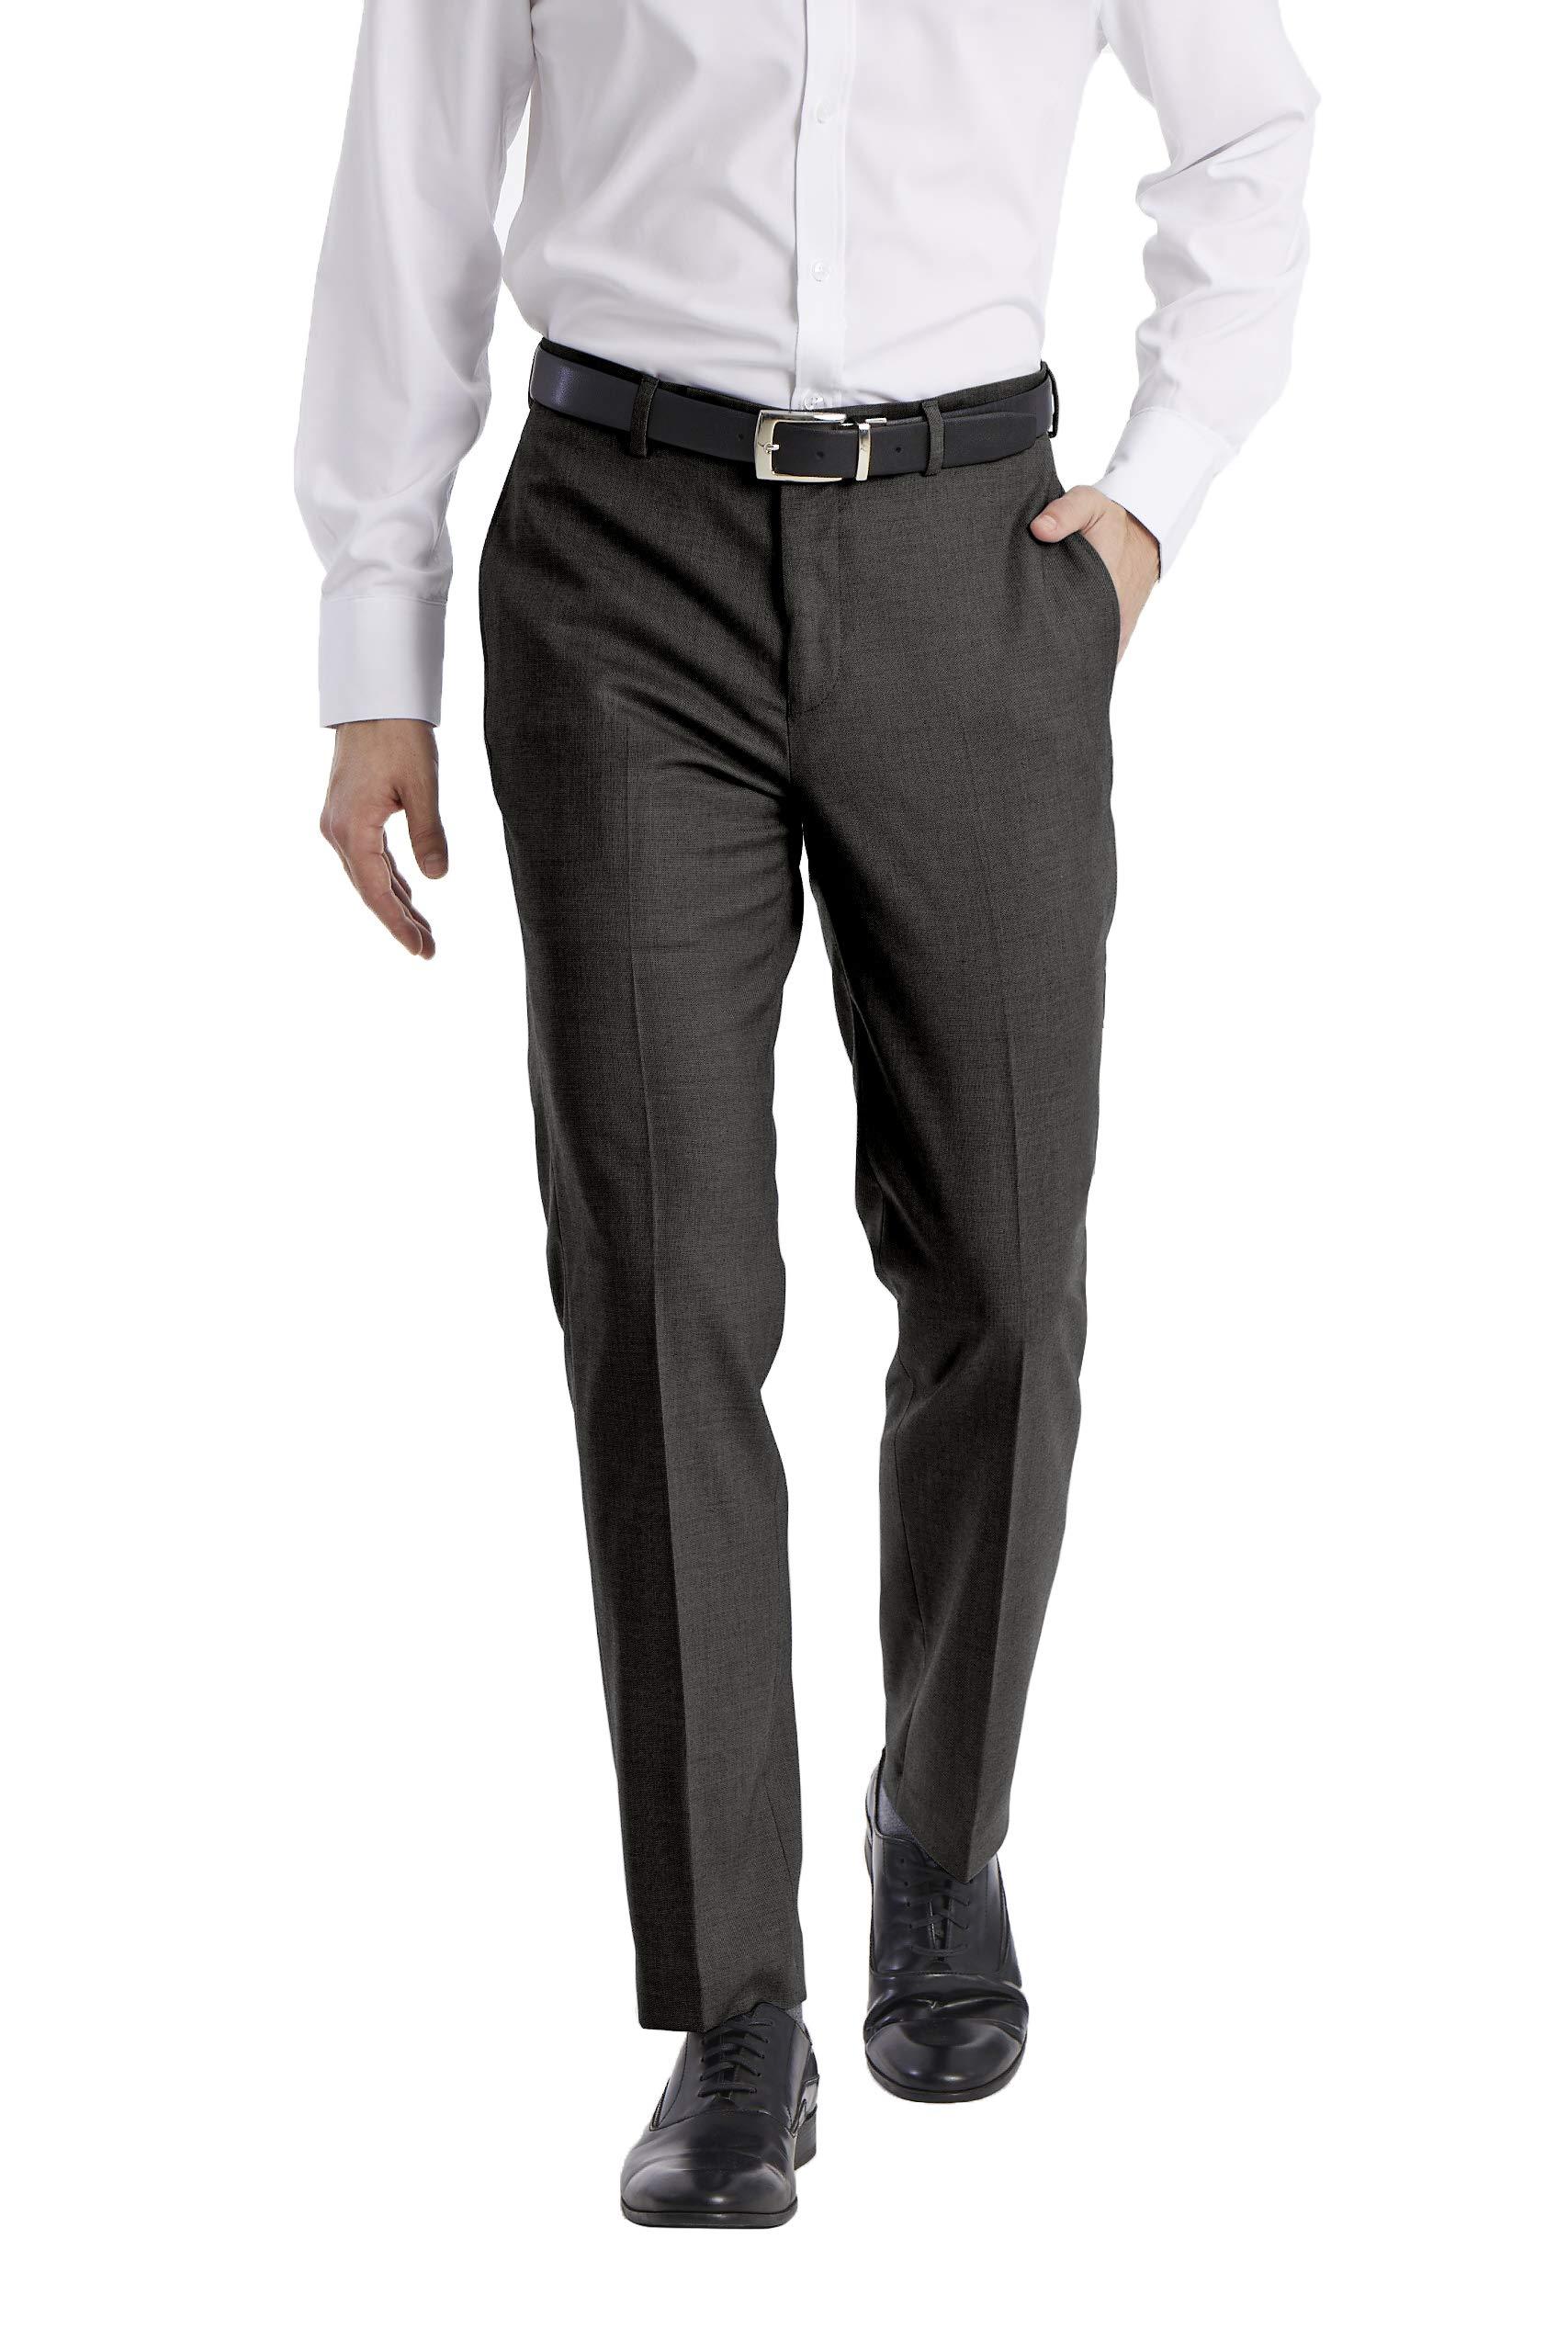 Calvin Klein Men's Slim Fit Stretch Suit Separates-Custom Jacket & Pant Size Selection, Charcoal Pant, 33W x 32L by Calvin Klein